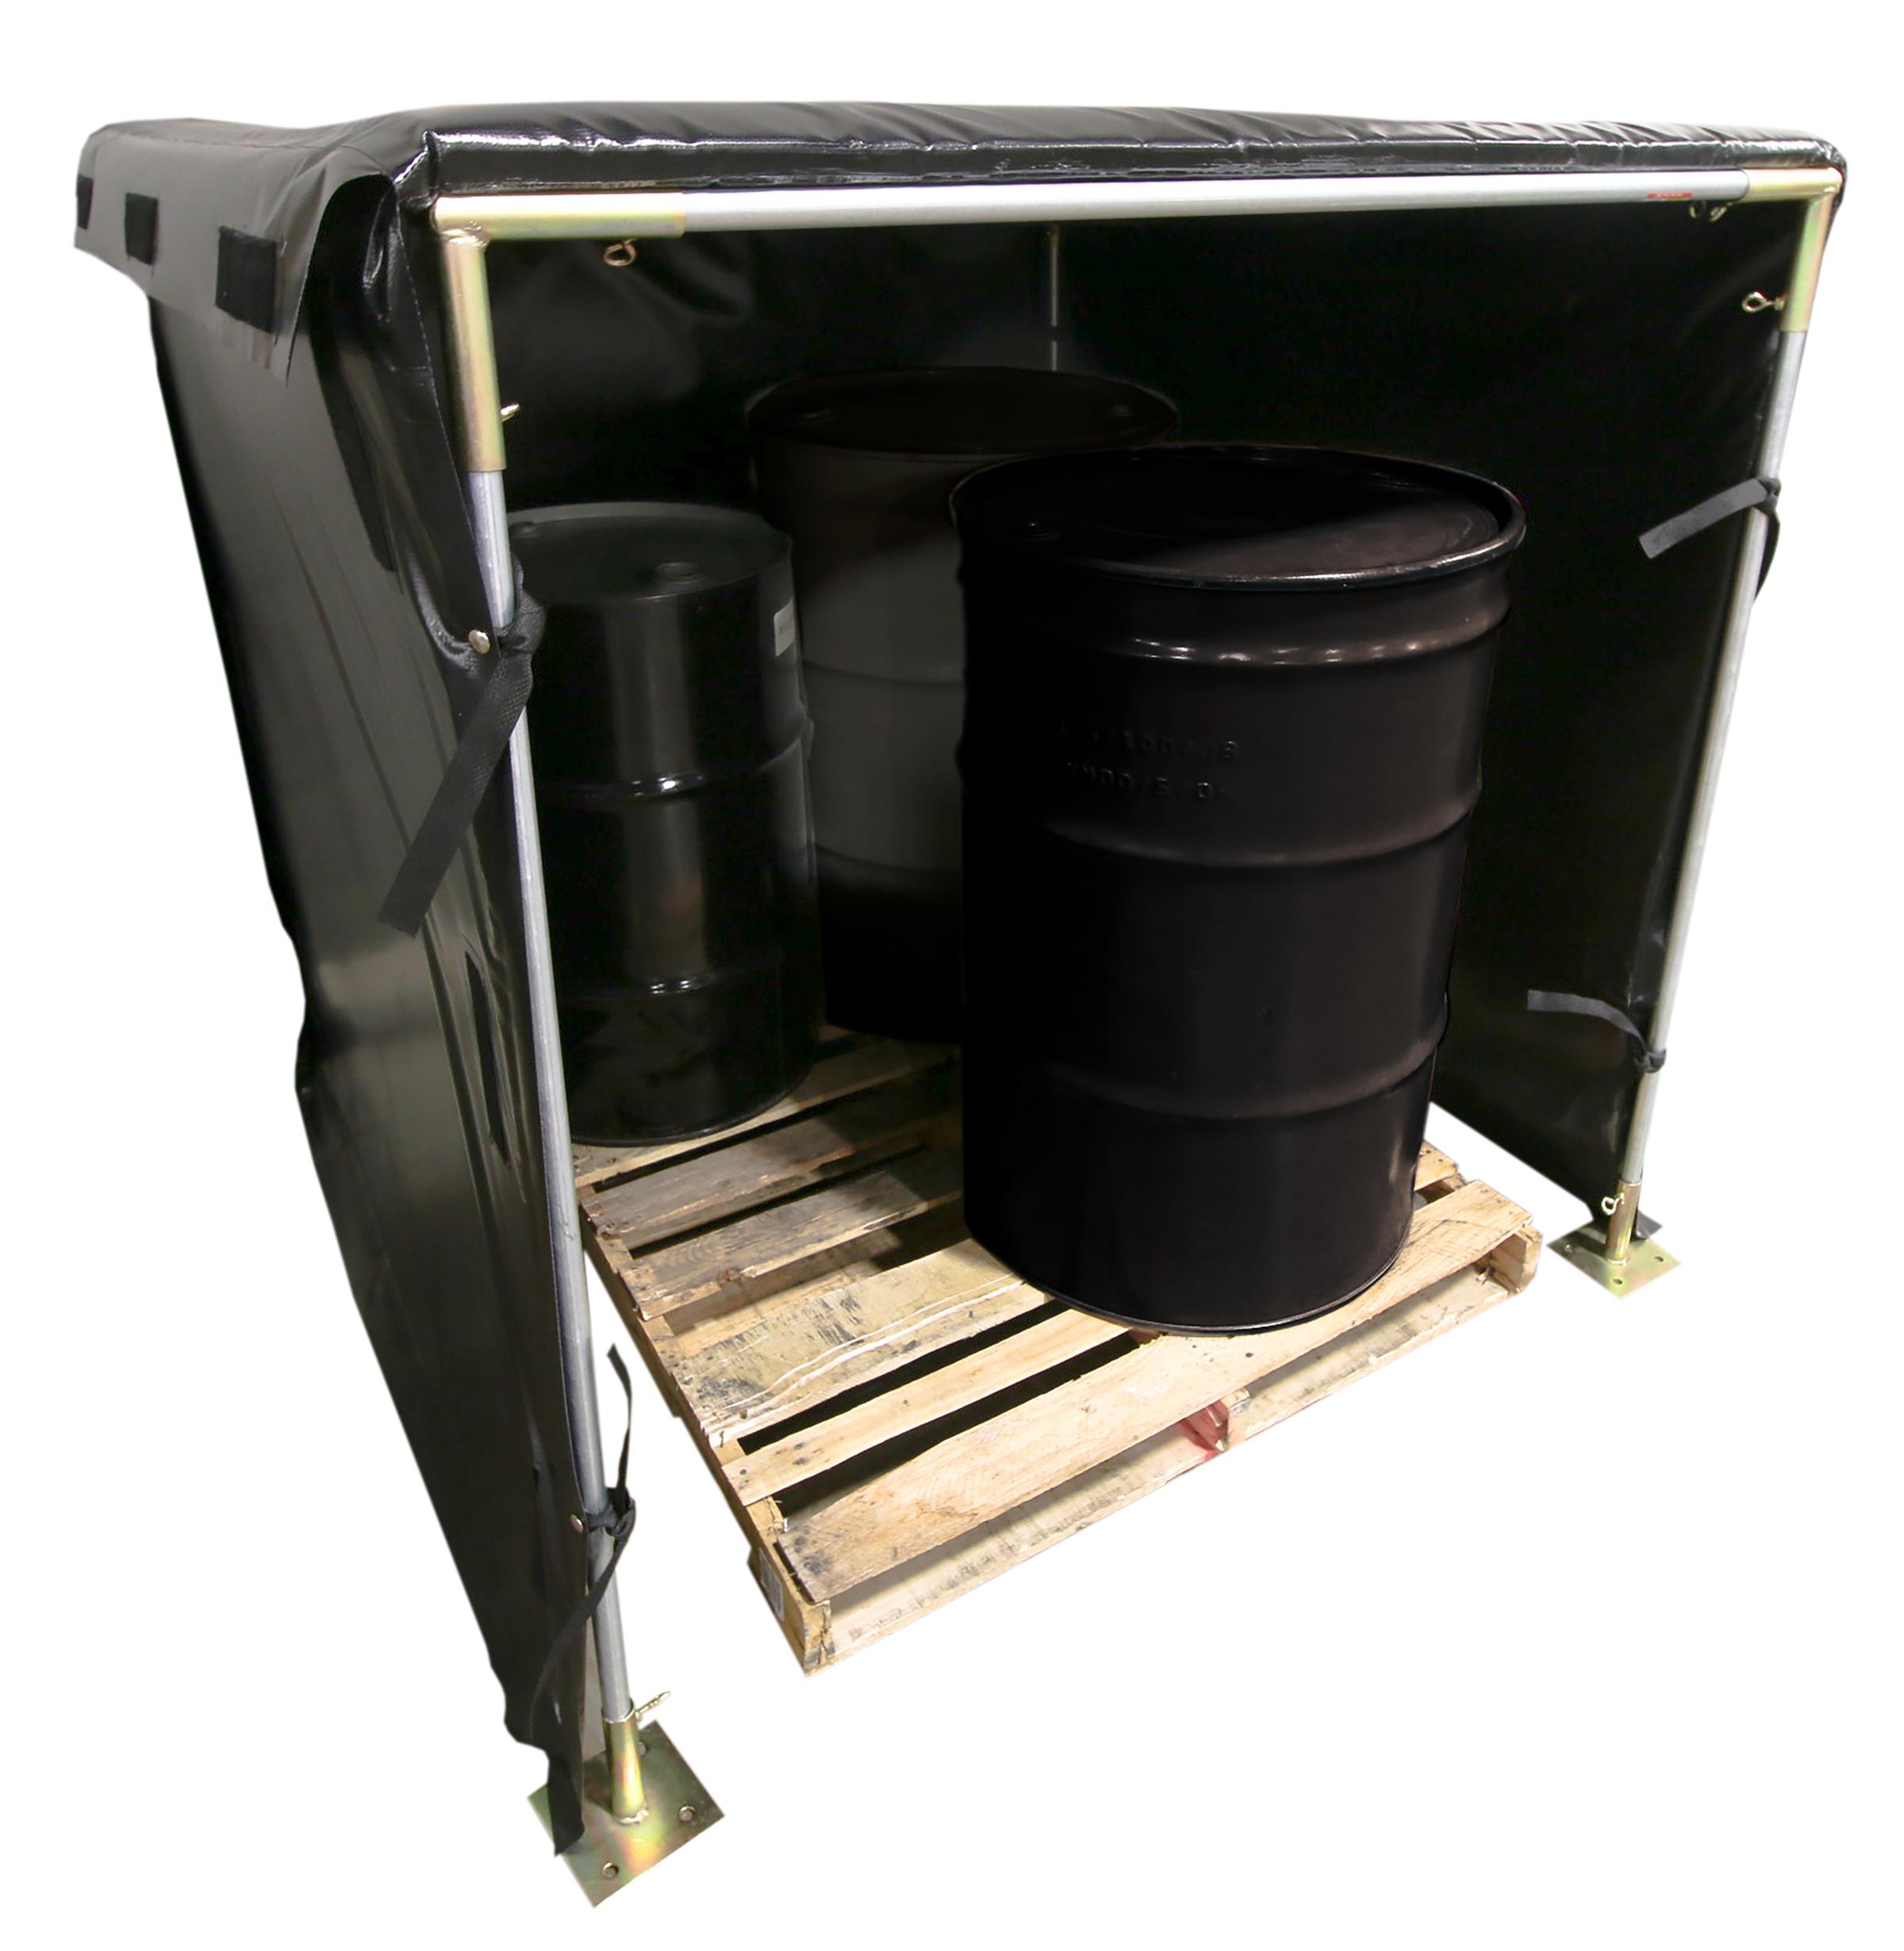 Powerblanket Hot Box